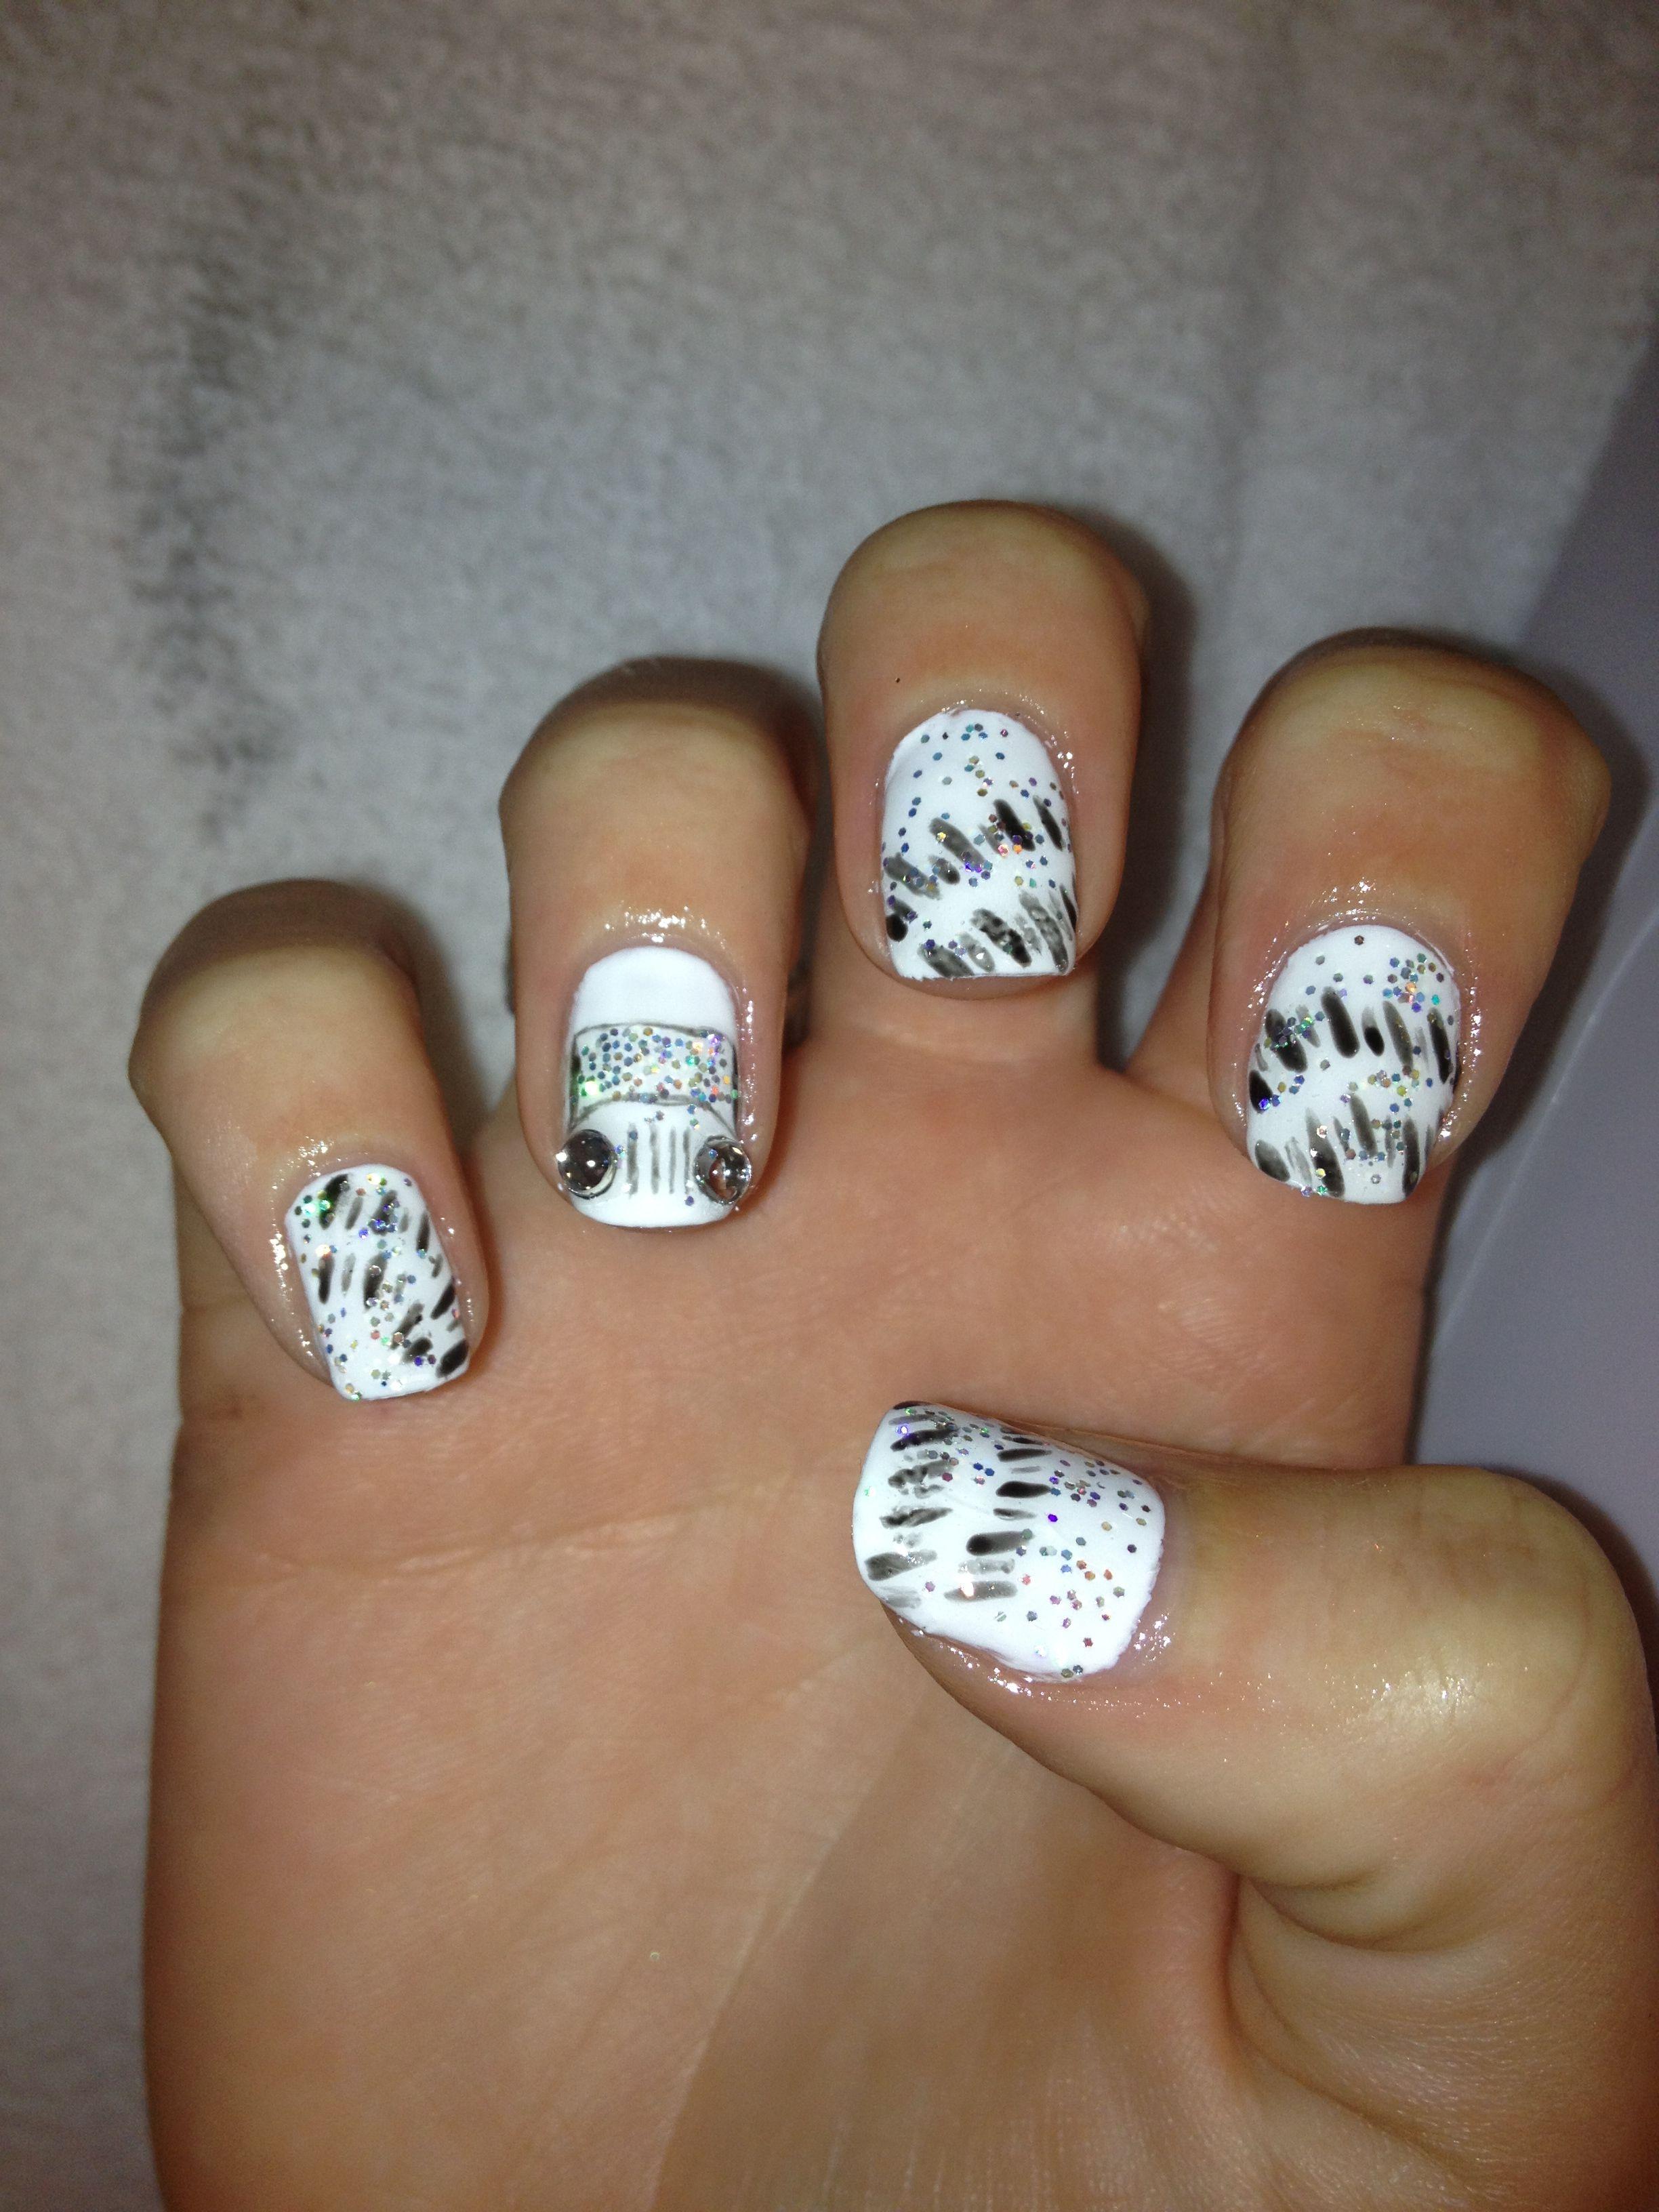 Jeep nails. | Nails | Pinterest | Jeeps, Camo nail art and Camo nails